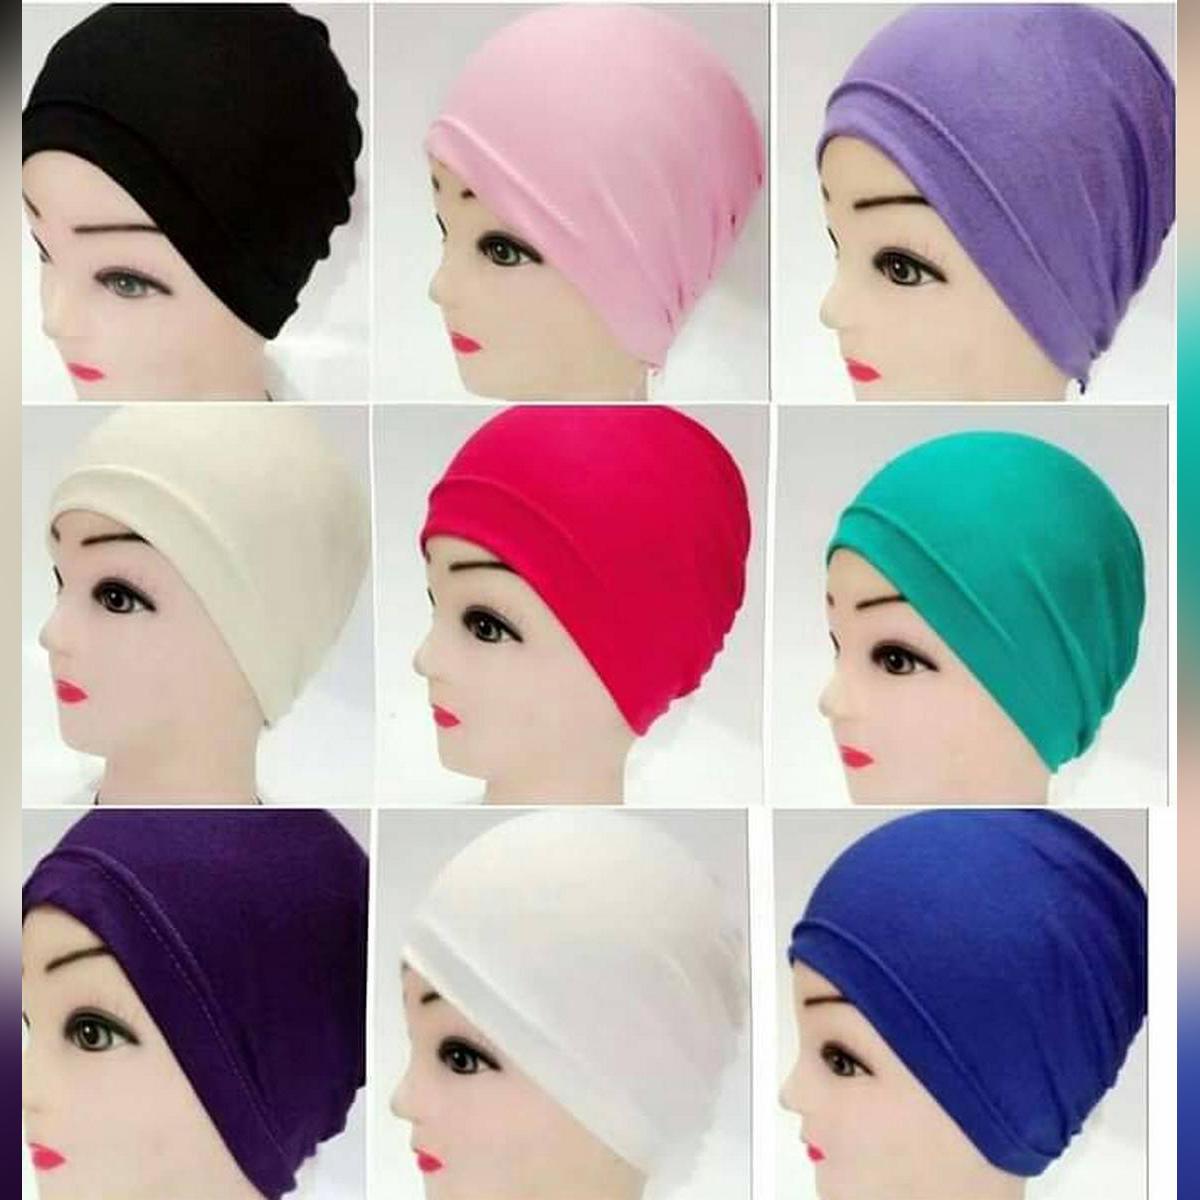 Pack of 3 Plain Muslim Headscarf Inner Hijab Caps Wraps Women Islamic Under Scarf Ninja Scarf Stretch Cotton Bonnet Caps